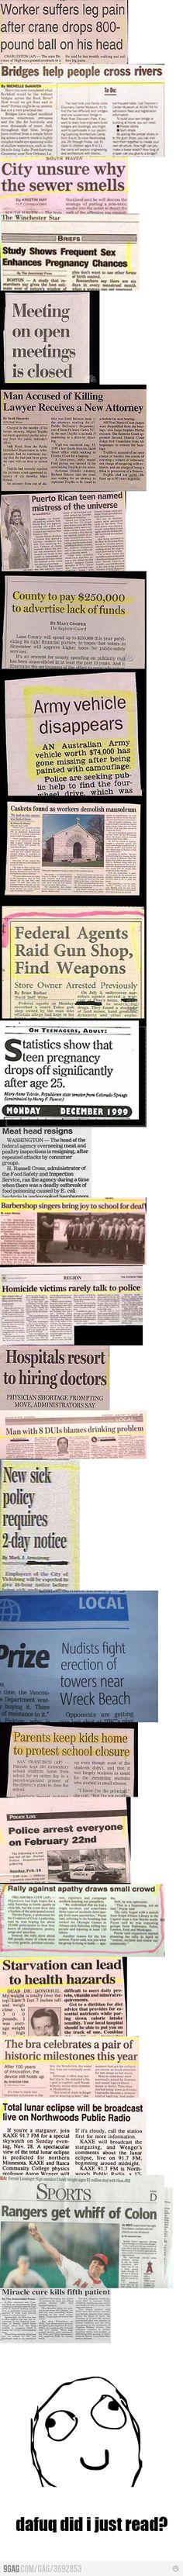 I love funny headlines.